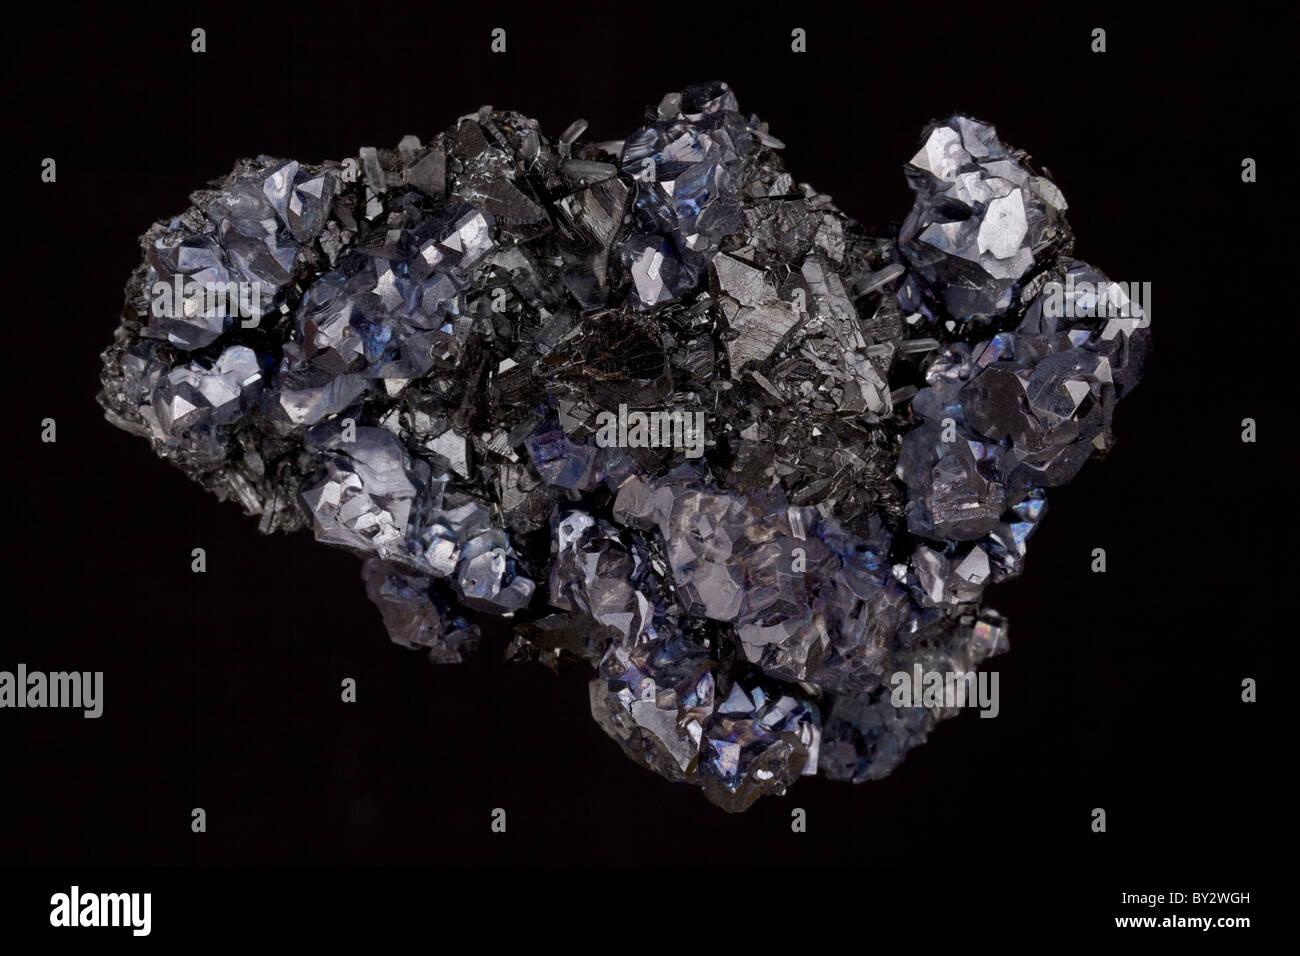 Galena -The primary ore of lead and Sphalerite the primary ore of zinc - Madan - Bulgaria - Stock Image